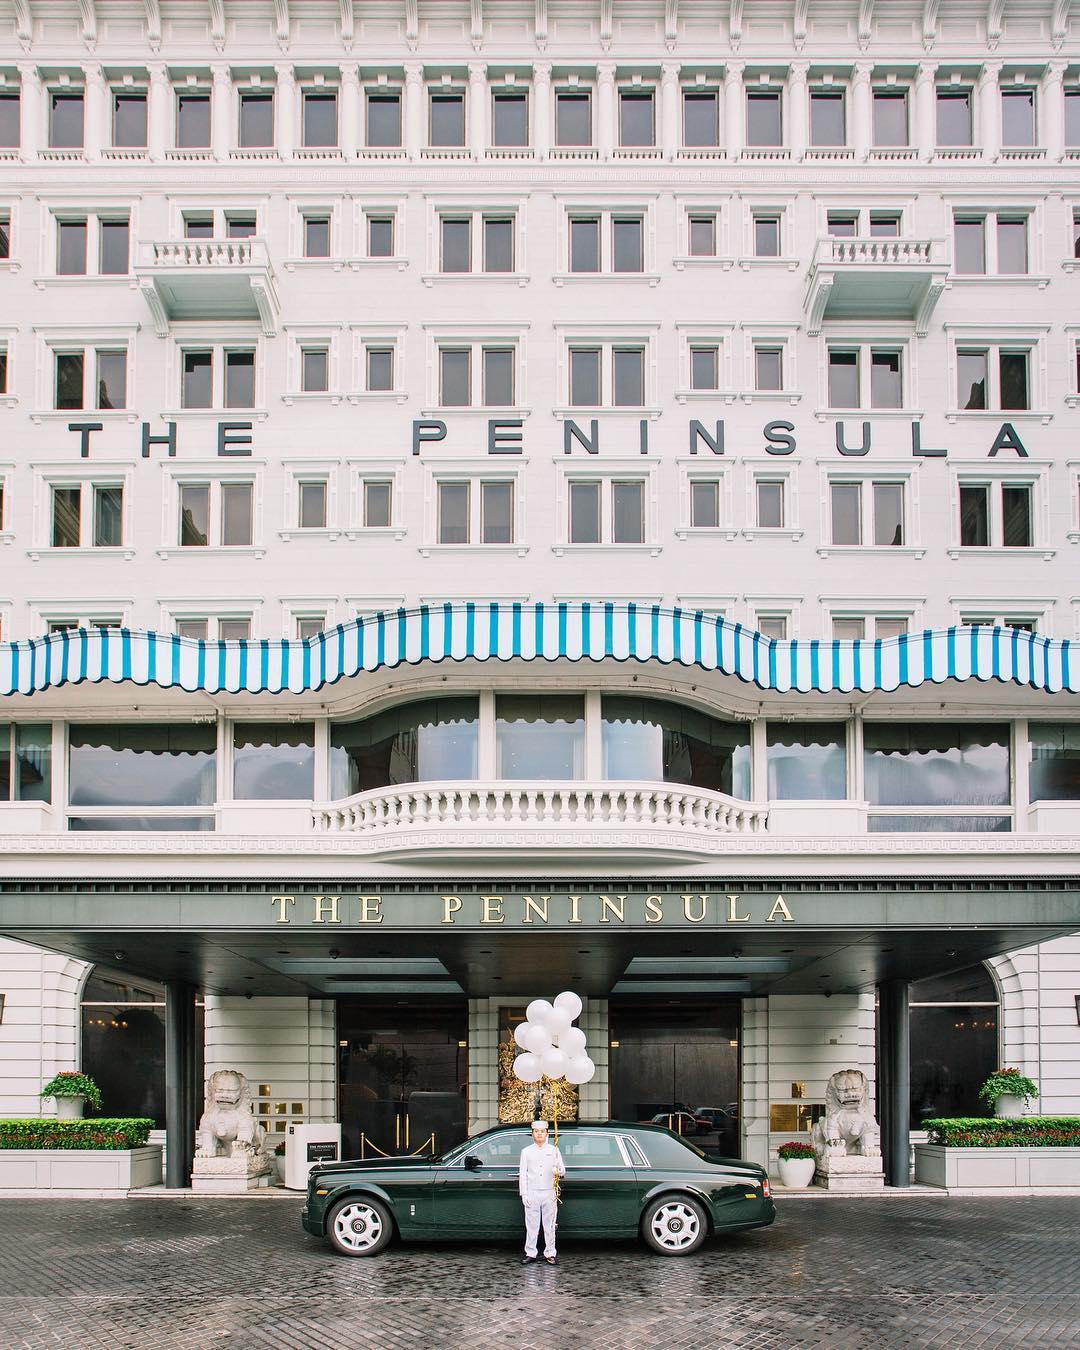 Архитектура и пейзажи Гонконга на снимках Виктора Ченга